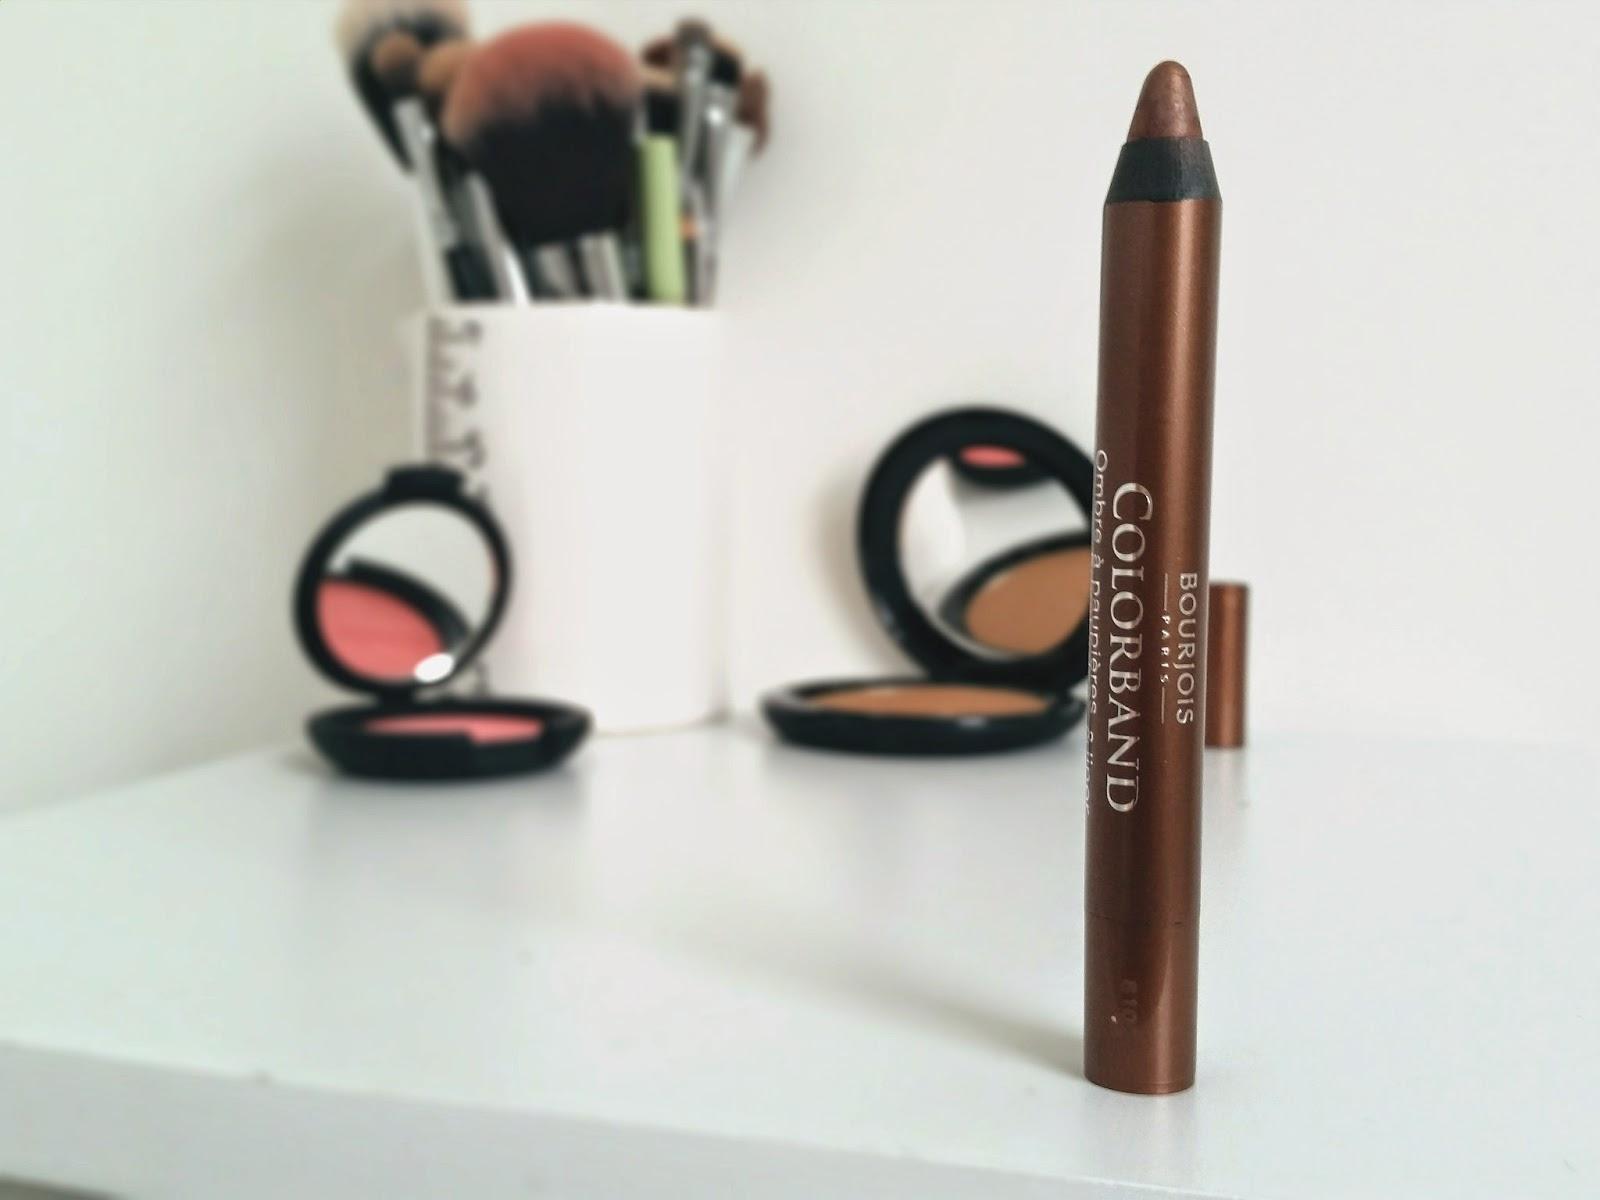 Bourjois Colorband 2-in-1 Eyeshadow & Liner